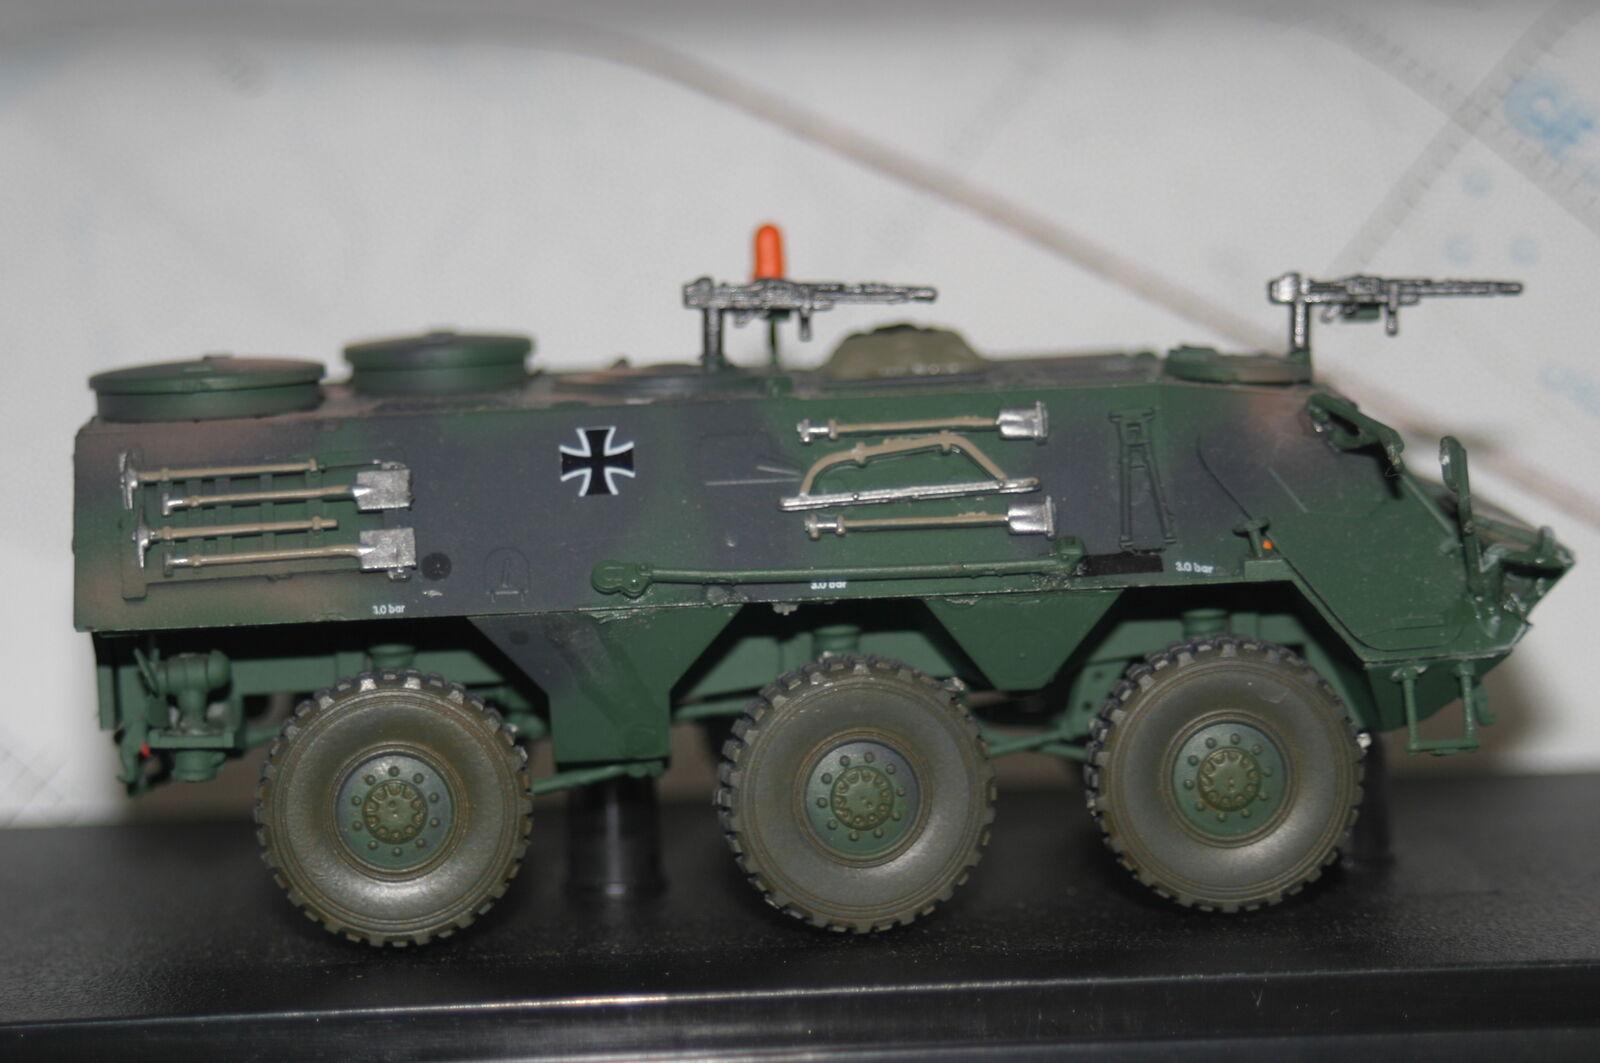 TPz Fuchs 1 a4 GERMANY piokp .320 GERMANY a4 1:72 PANZERSTAHL 88021 8d90ed